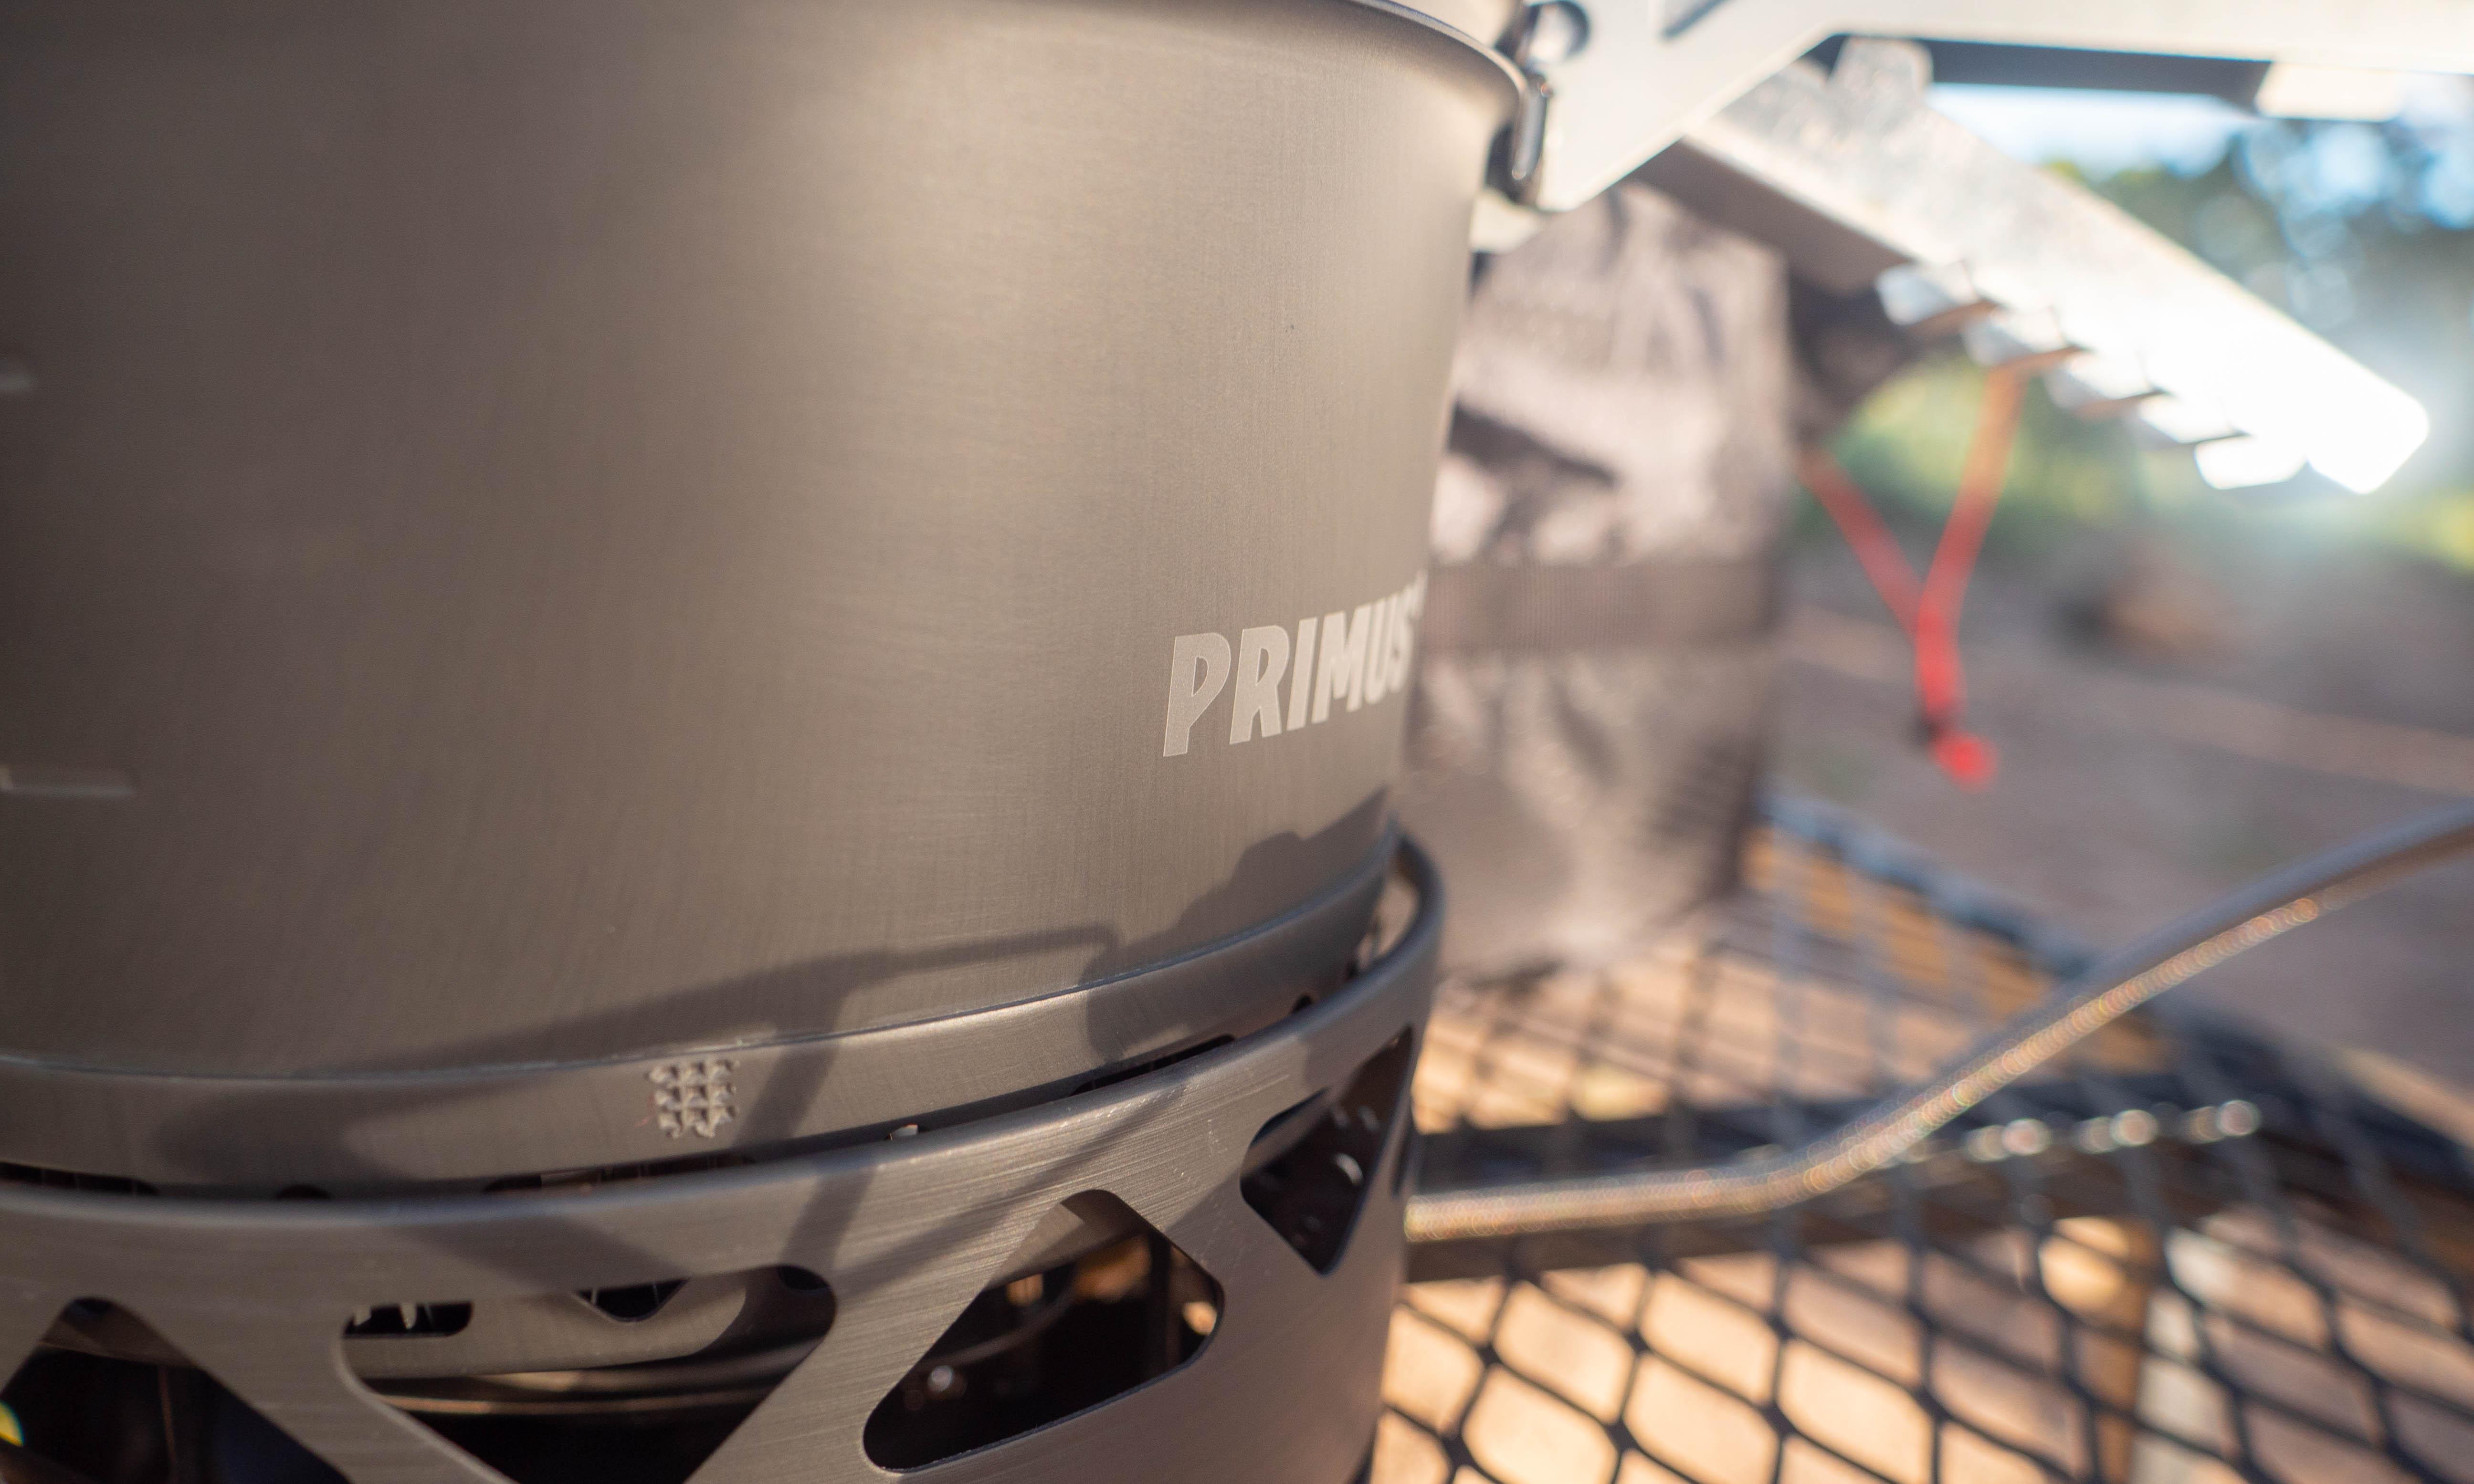 primus-primtech-stoveset-review-getting-to-zero